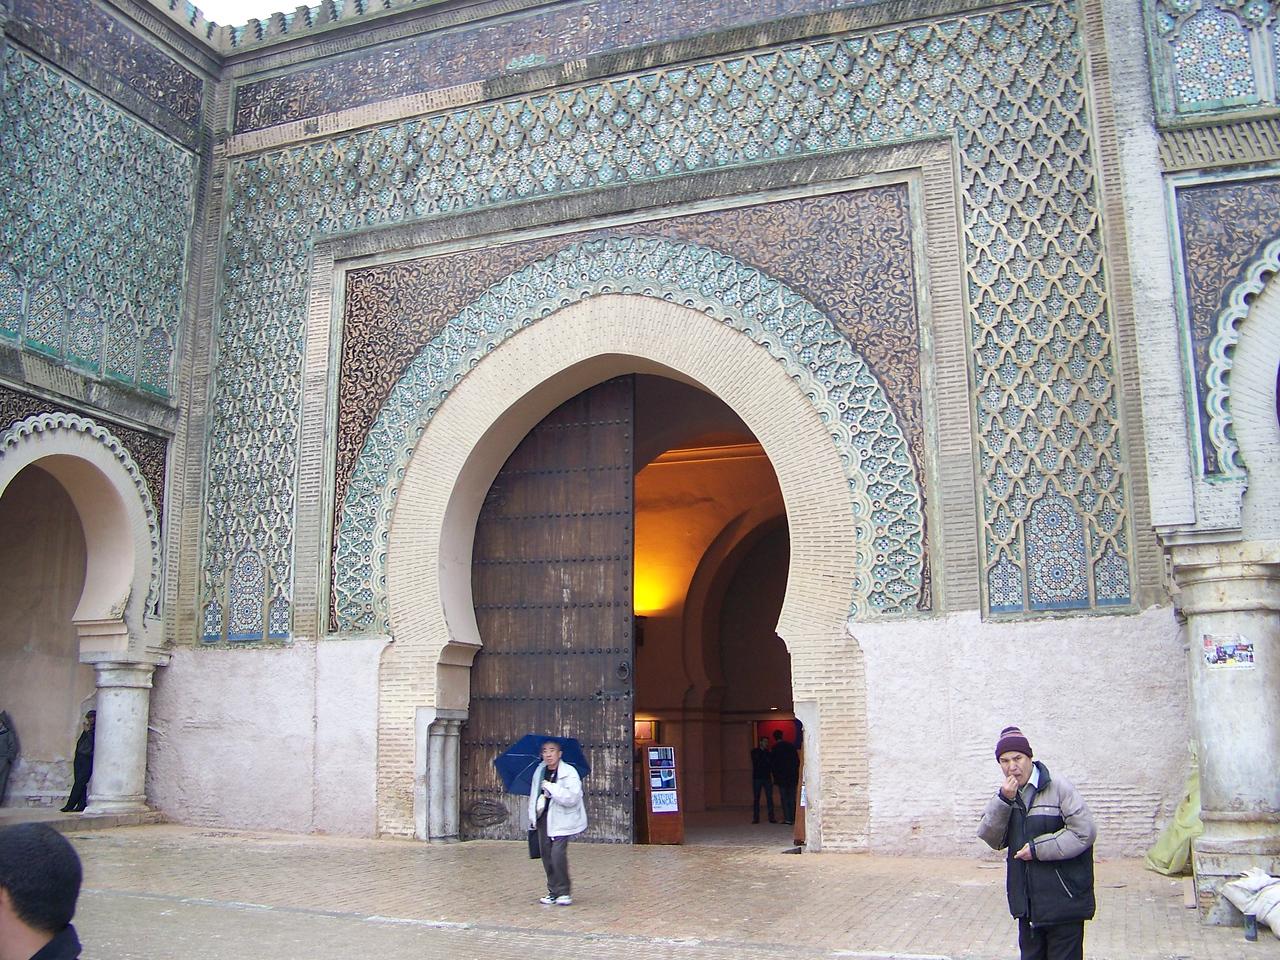 0037 - Bab Mansour El Alj Gate - Southern Gate of the Medina - Meknes Morocco.JPG